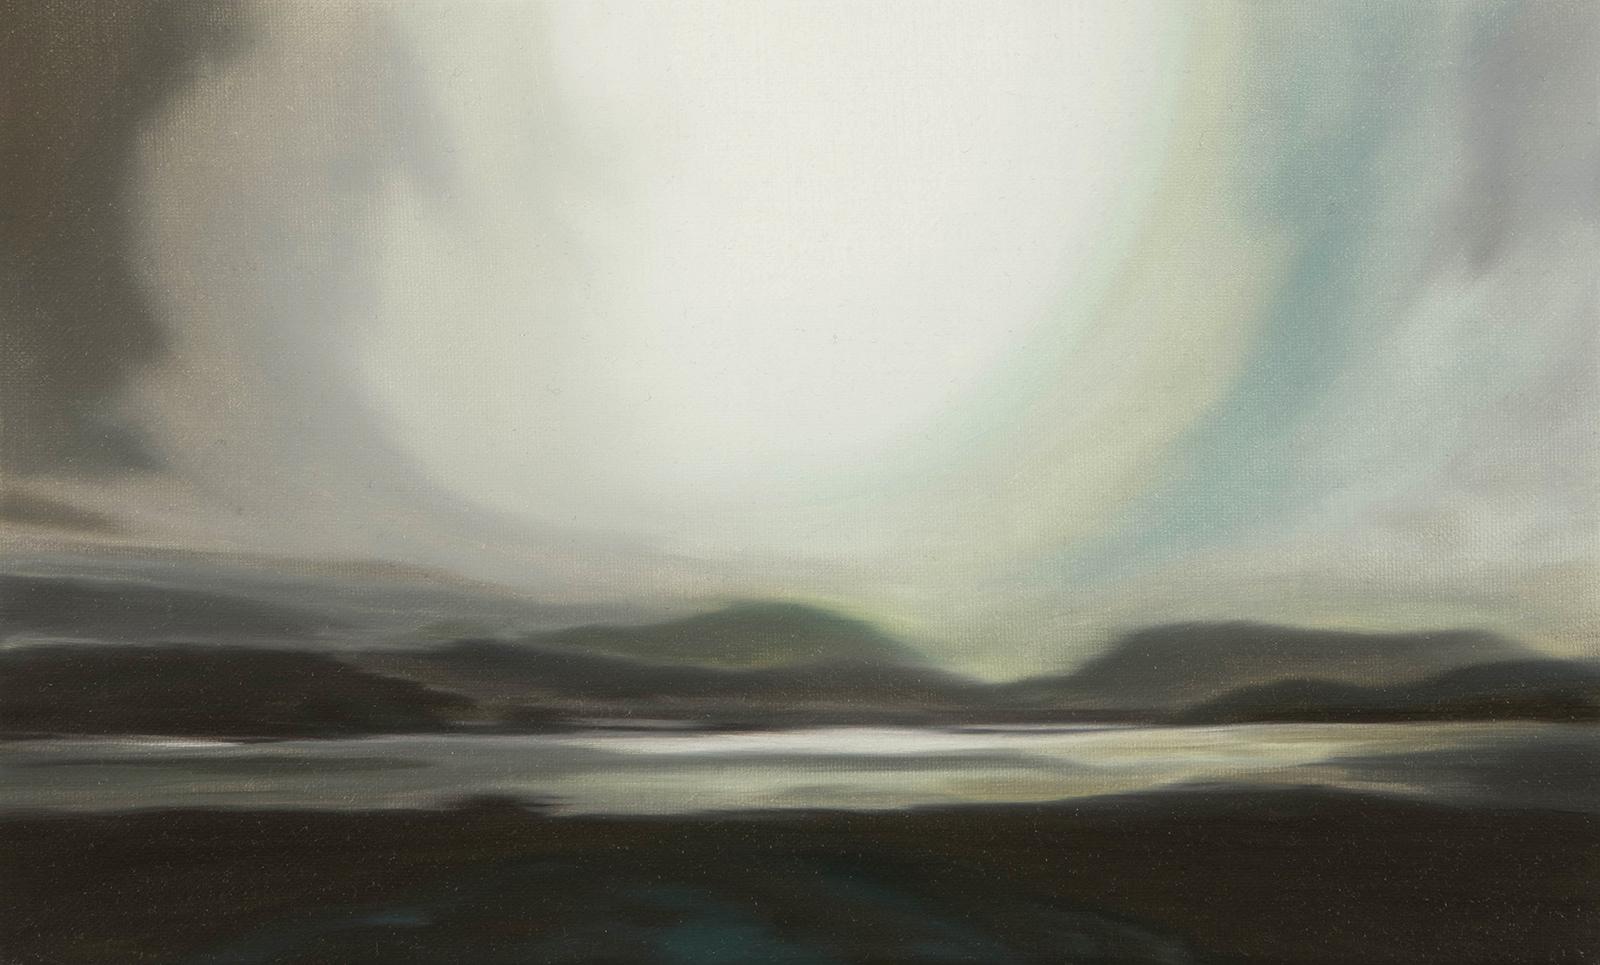 Orkney Inseln 2007, 20 x 33 cm, Öl auf Leinwand  Orkney Islands 2007, oil on canvas